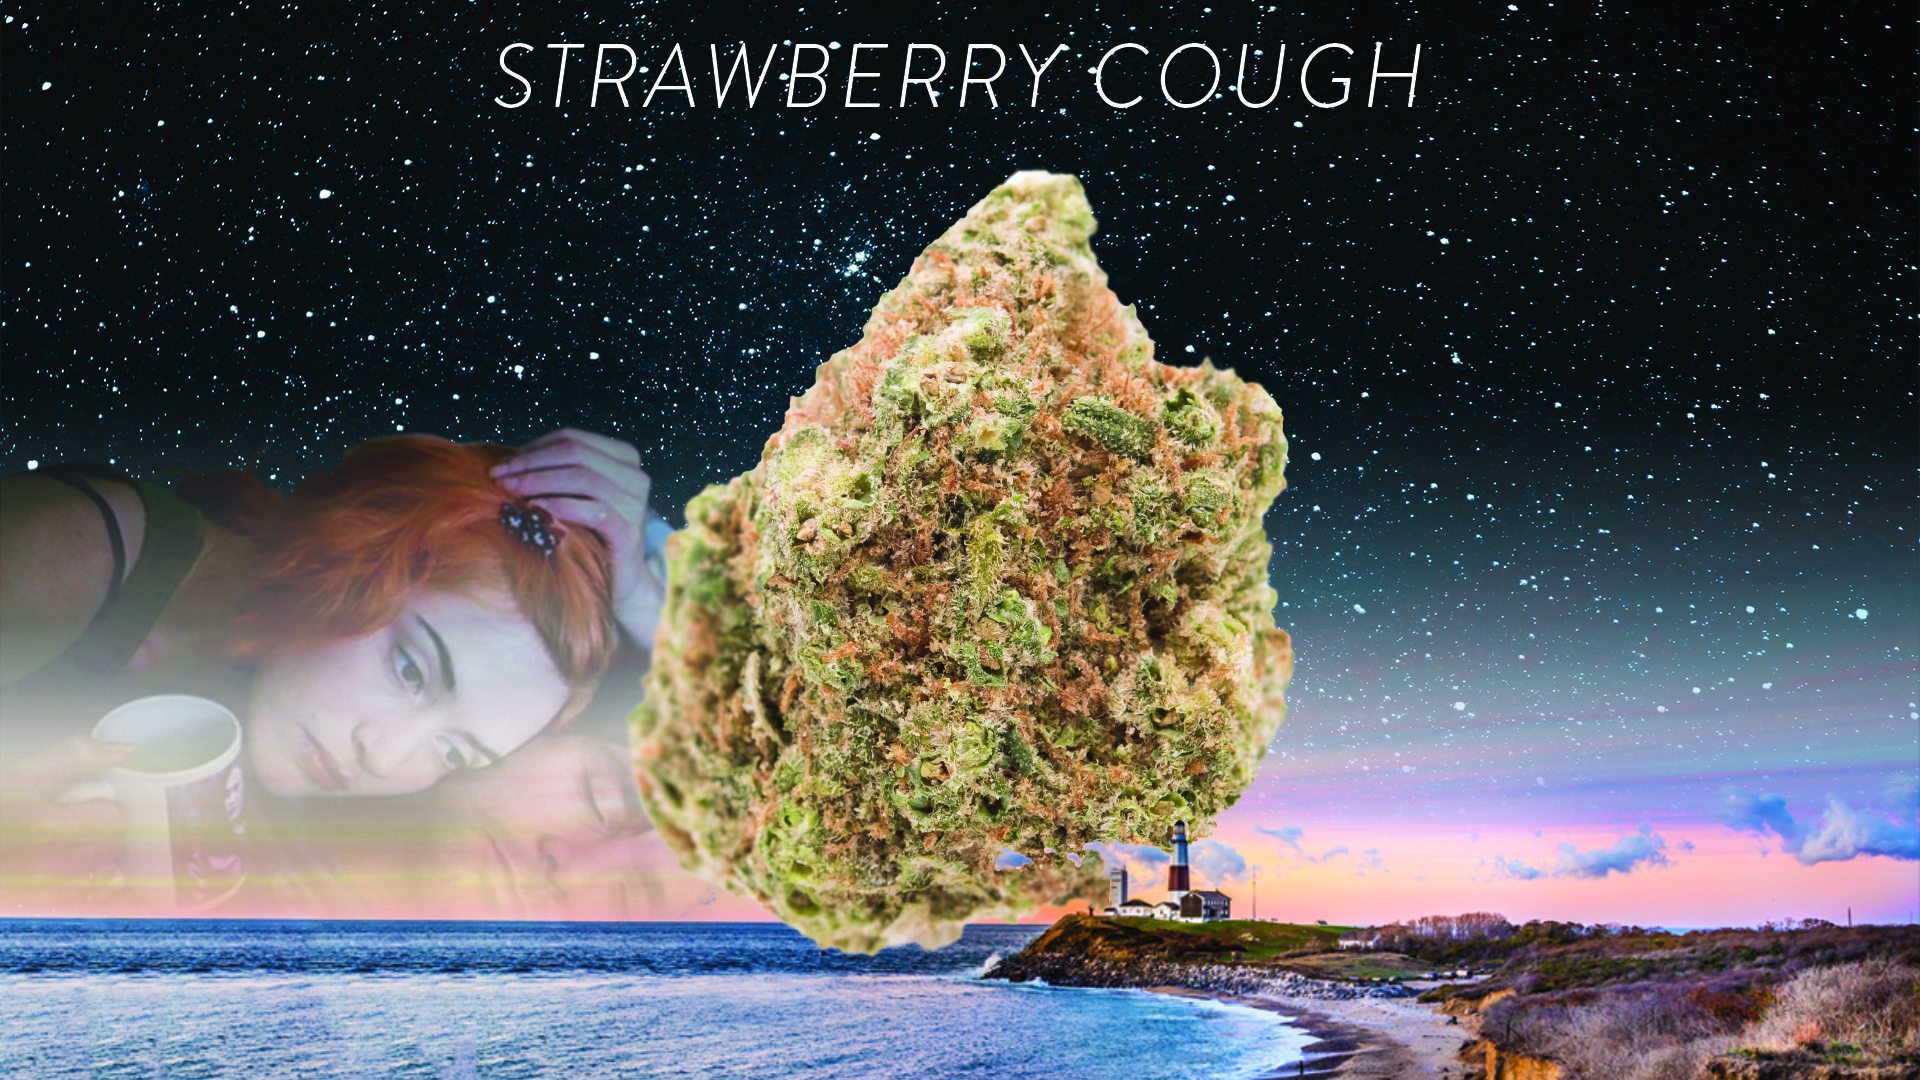 Headlight-Cannabis-Strawberry-Cough-Far-Out-Films.jpg